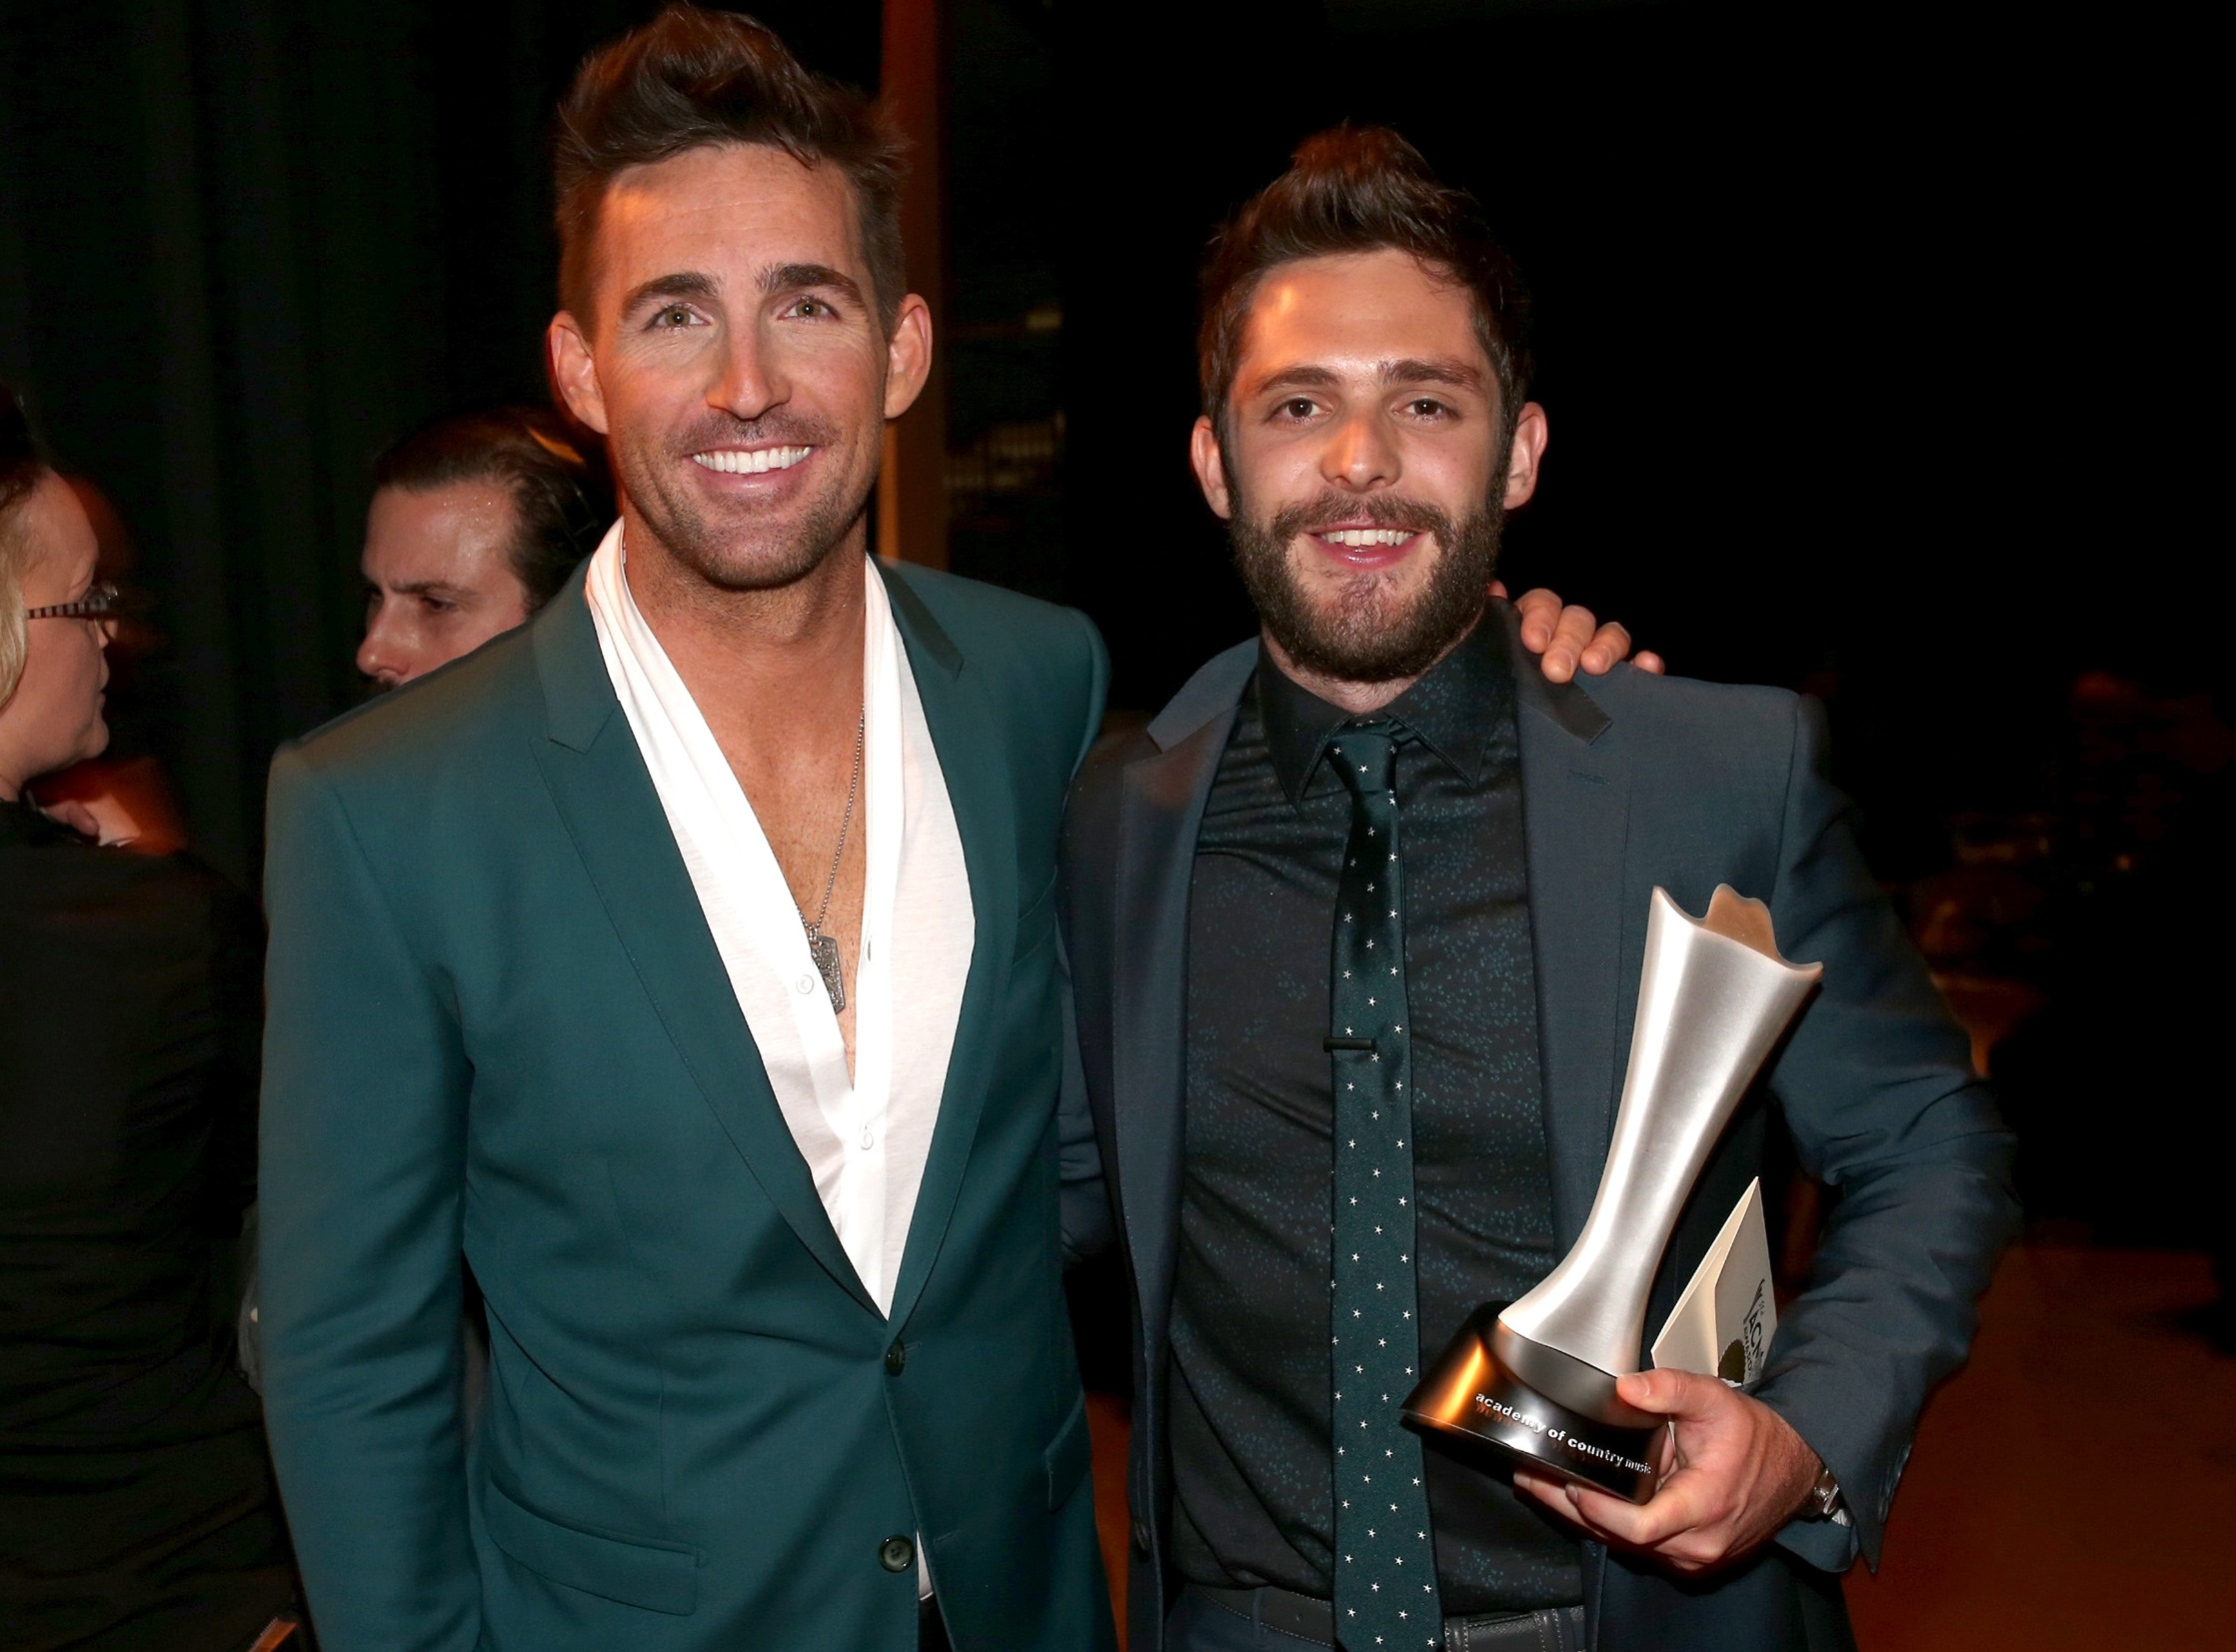 Jake Owen Relates to Thomas Rhett's Fatherly Love